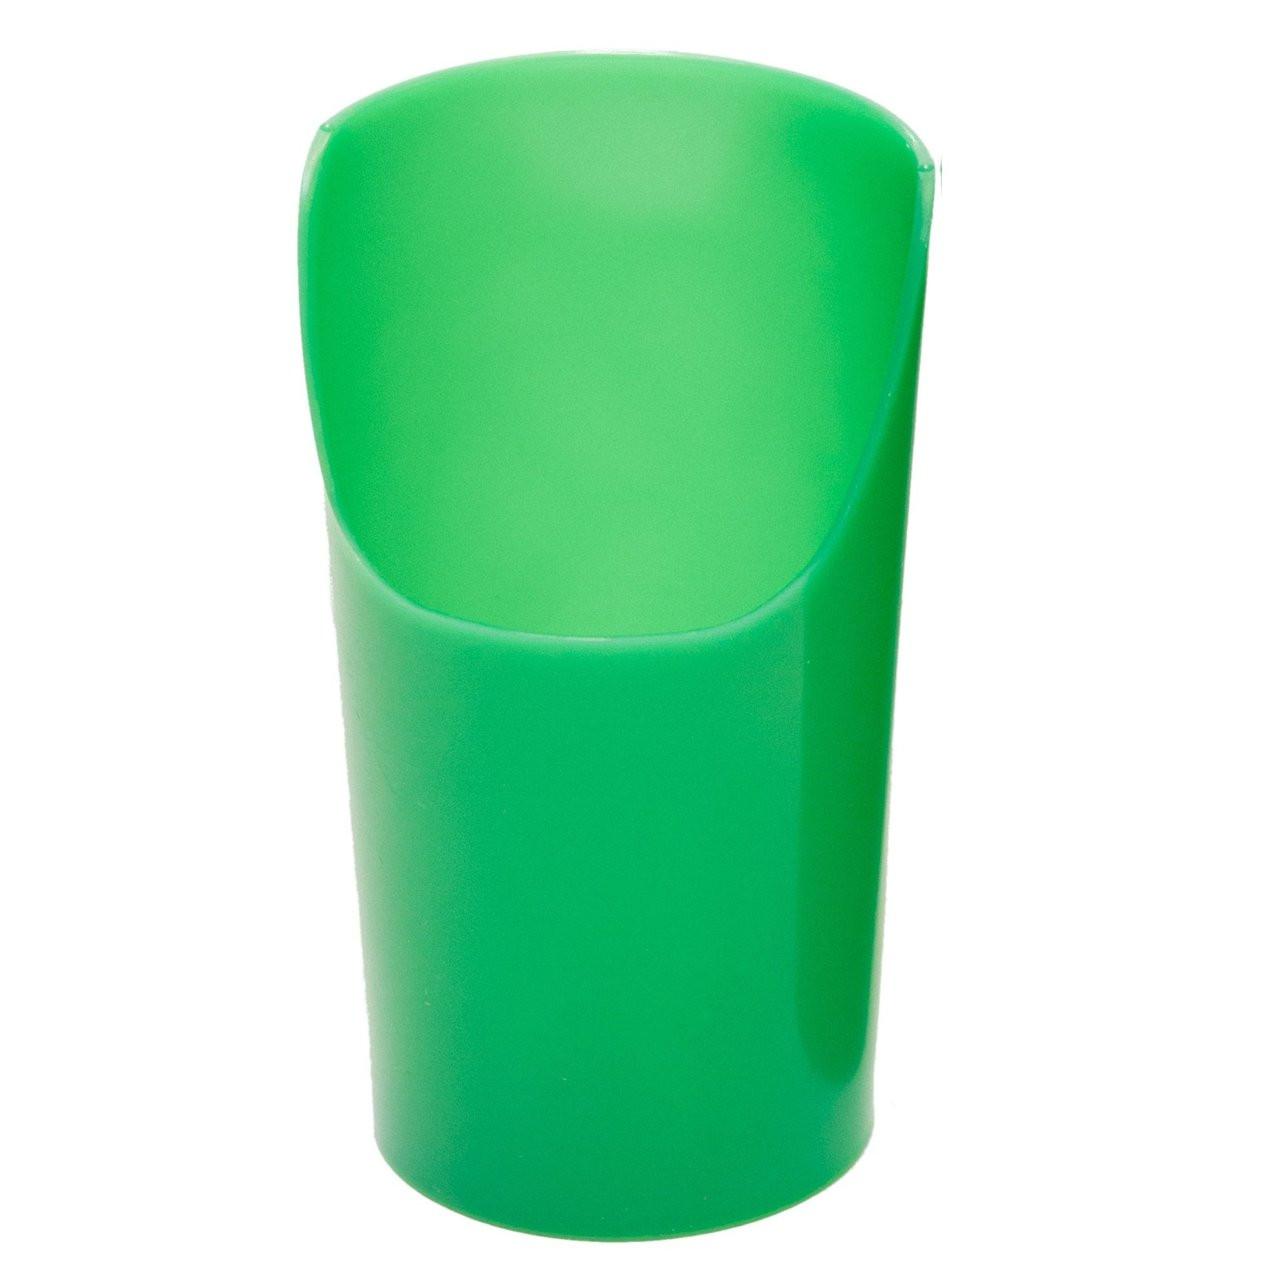 Flexi Cup - Large